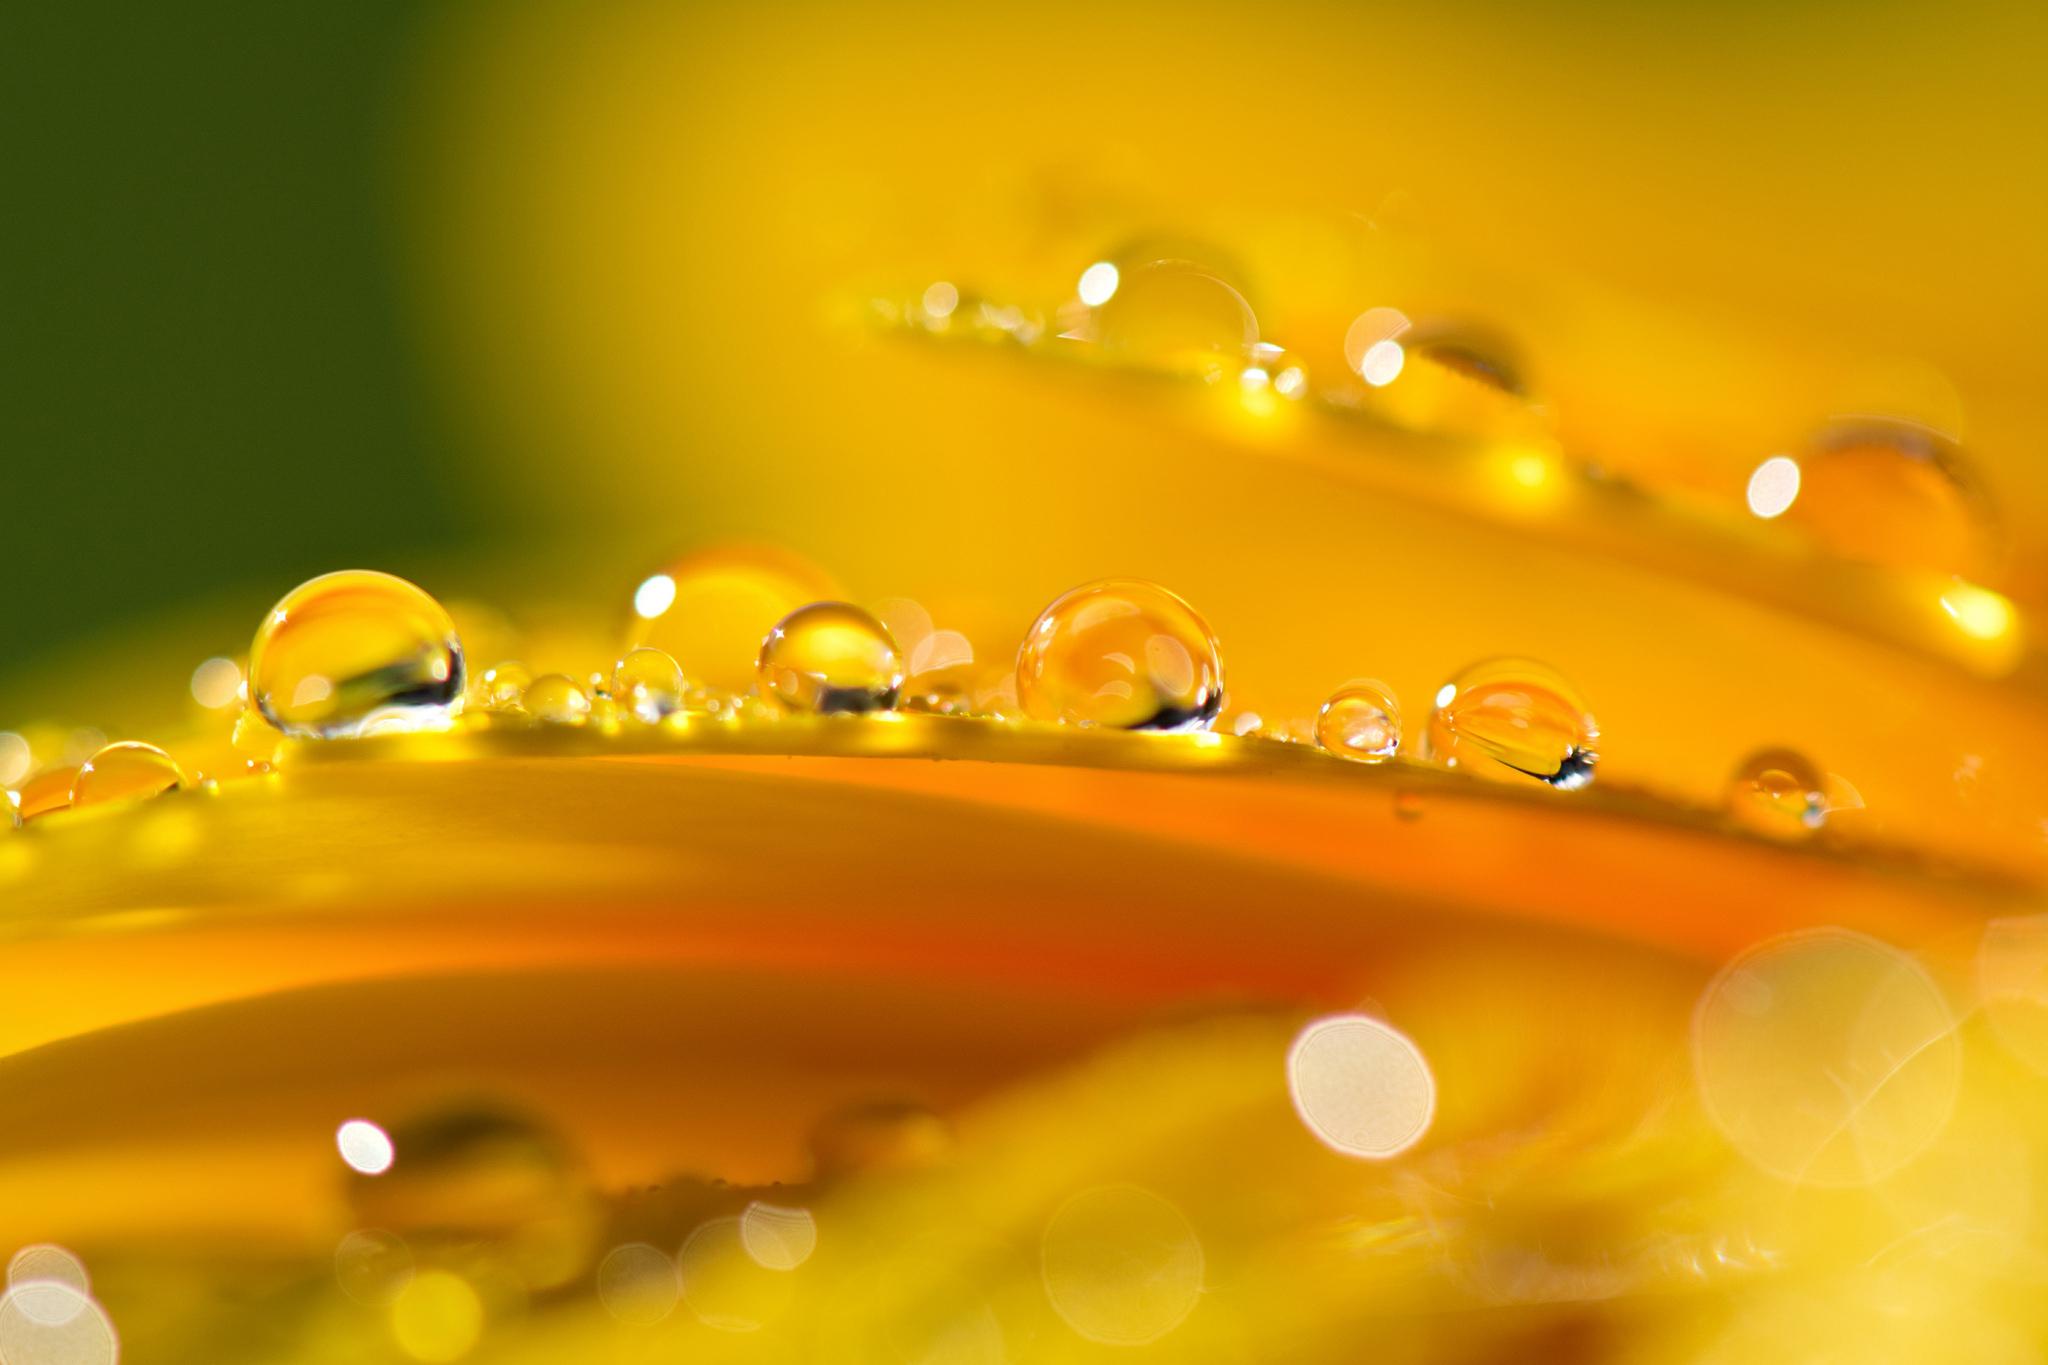 листок капля желтый на воде  № 2777398 бесплатно